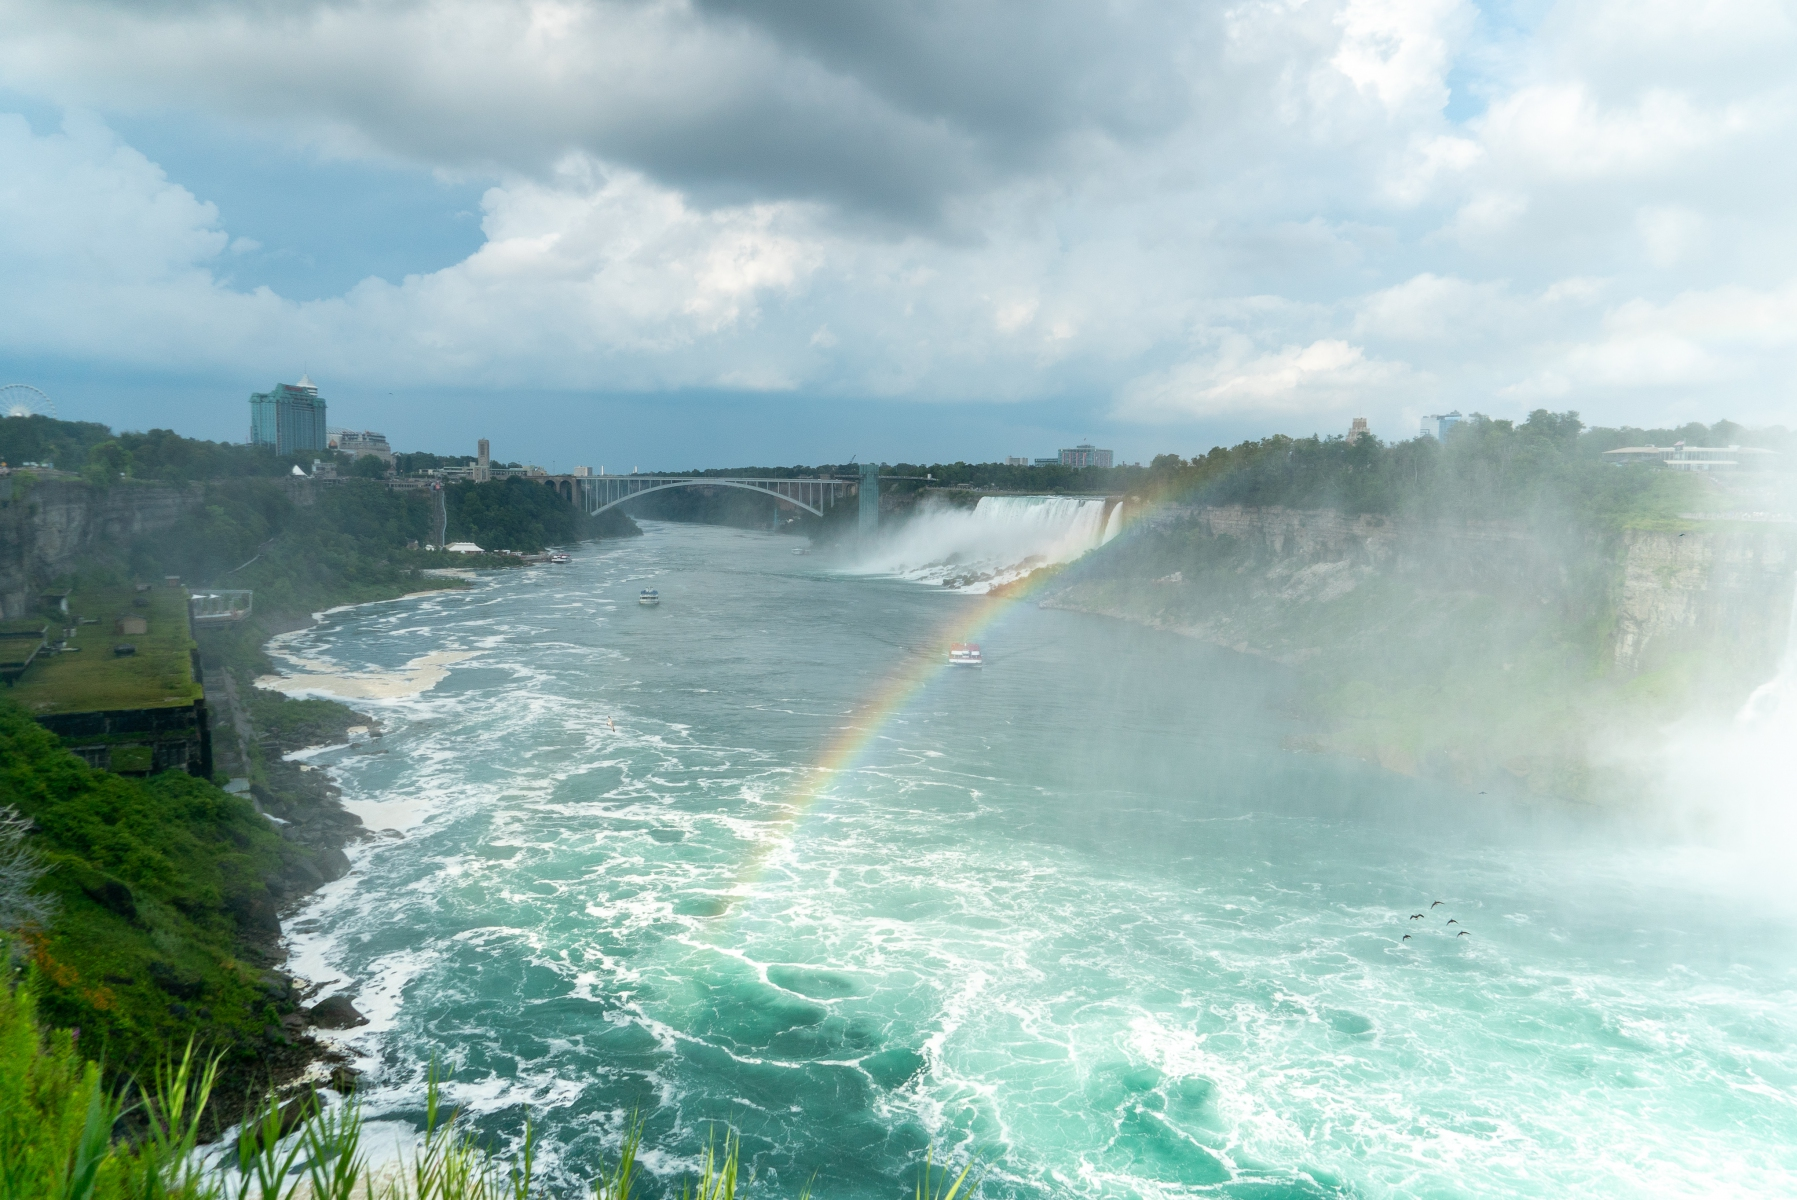 Falls with rainbow